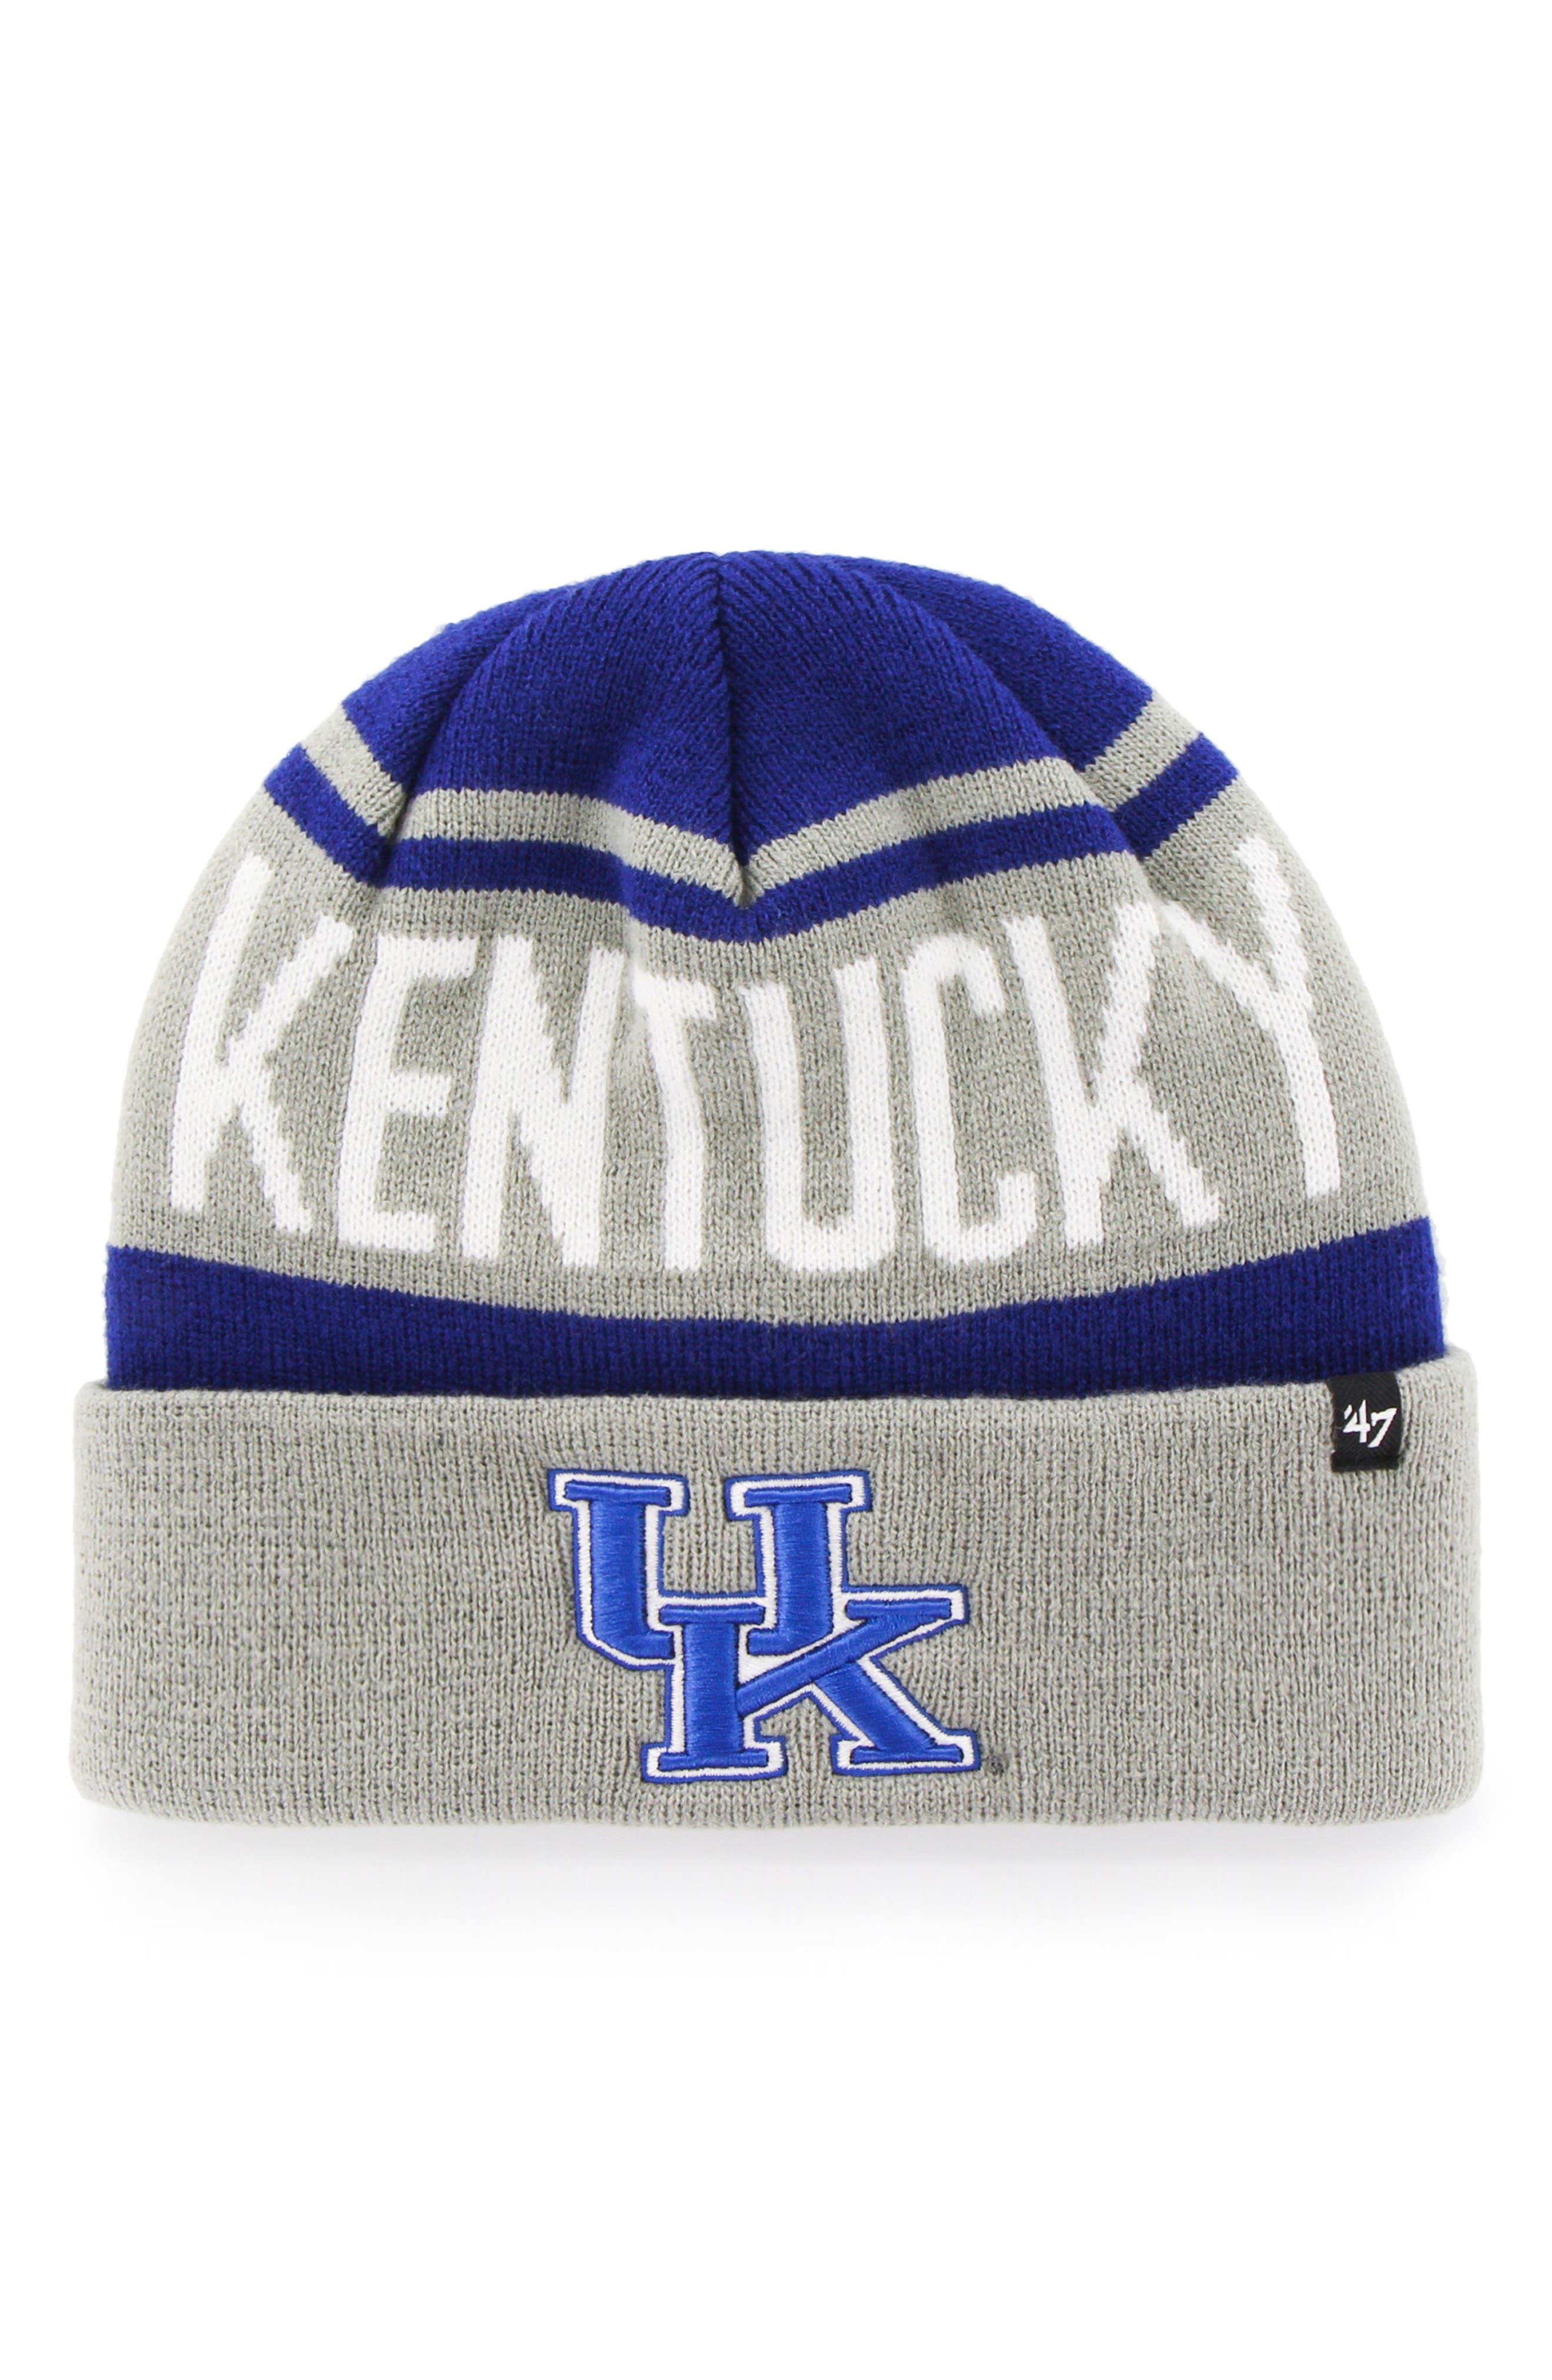 47 Brand University of Kentucky Knit Beanie,                             Main thumbnail 1, color,                             400